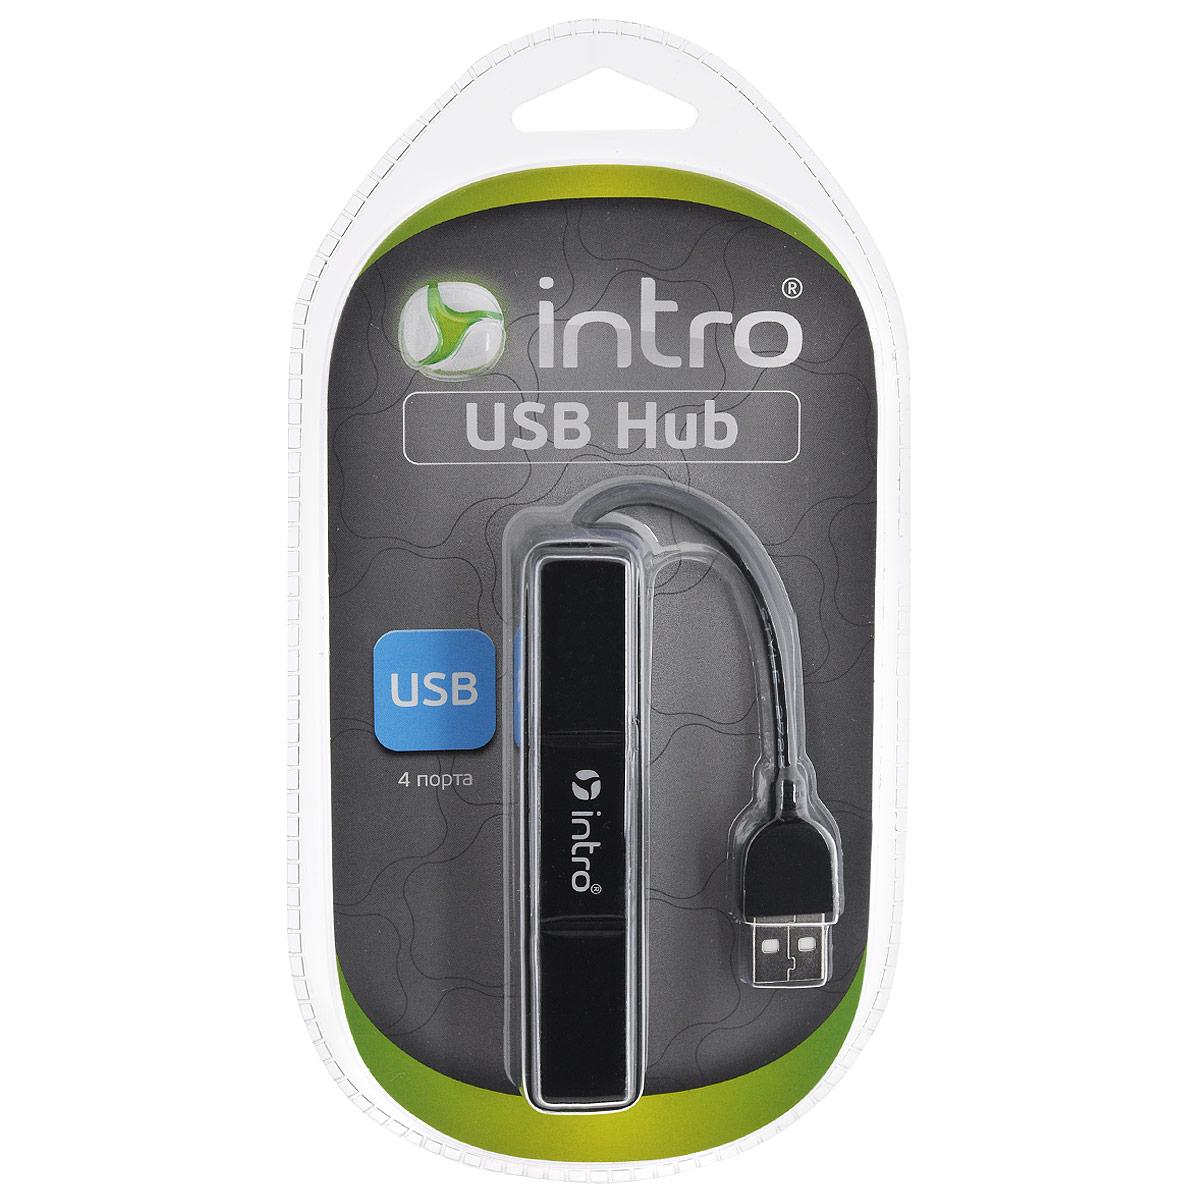 Intro Н510, Black USB-концентраторH510USB концентратор Intro Н510 с четырьмя разъемами и гибким коннектором.